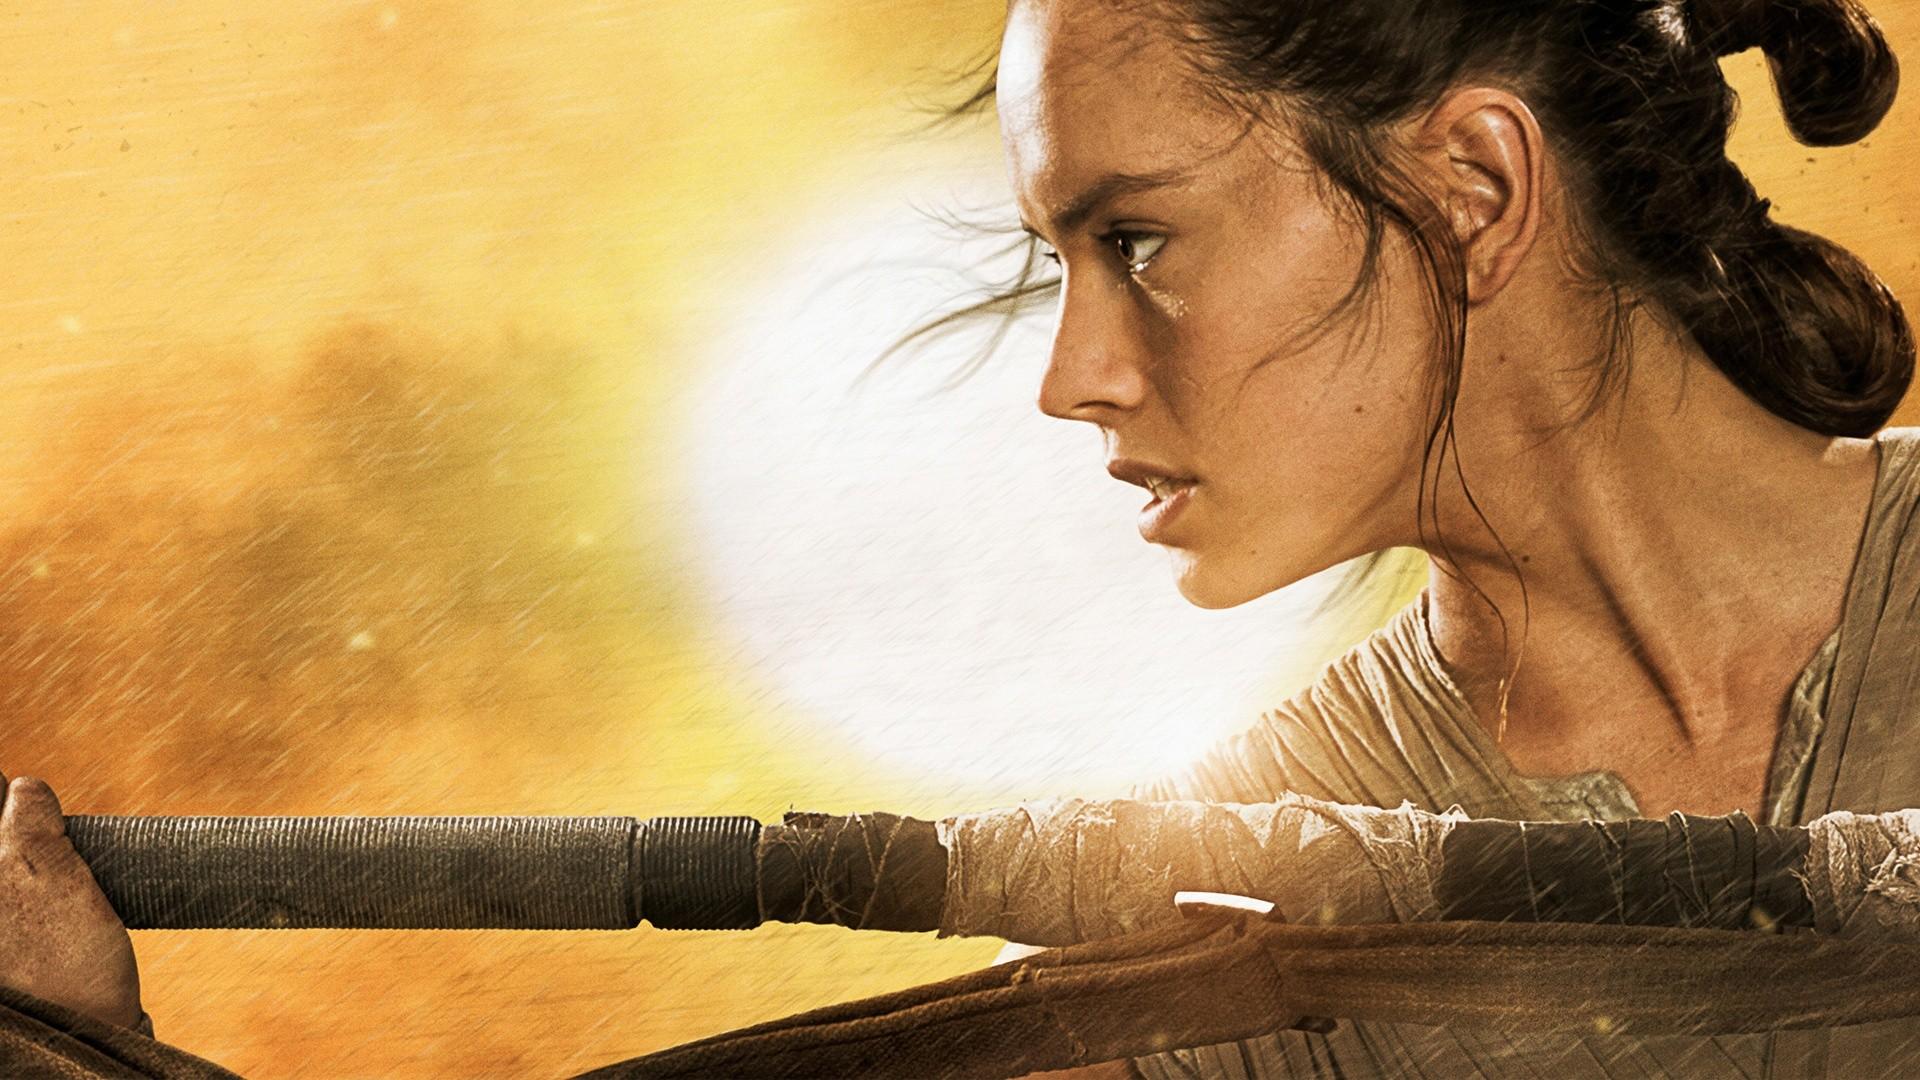 Best Wallpaper Movie Rey - 155015-rey-star-wars-wallpaper-1920x1080-tablet  Picture_204835.jpg